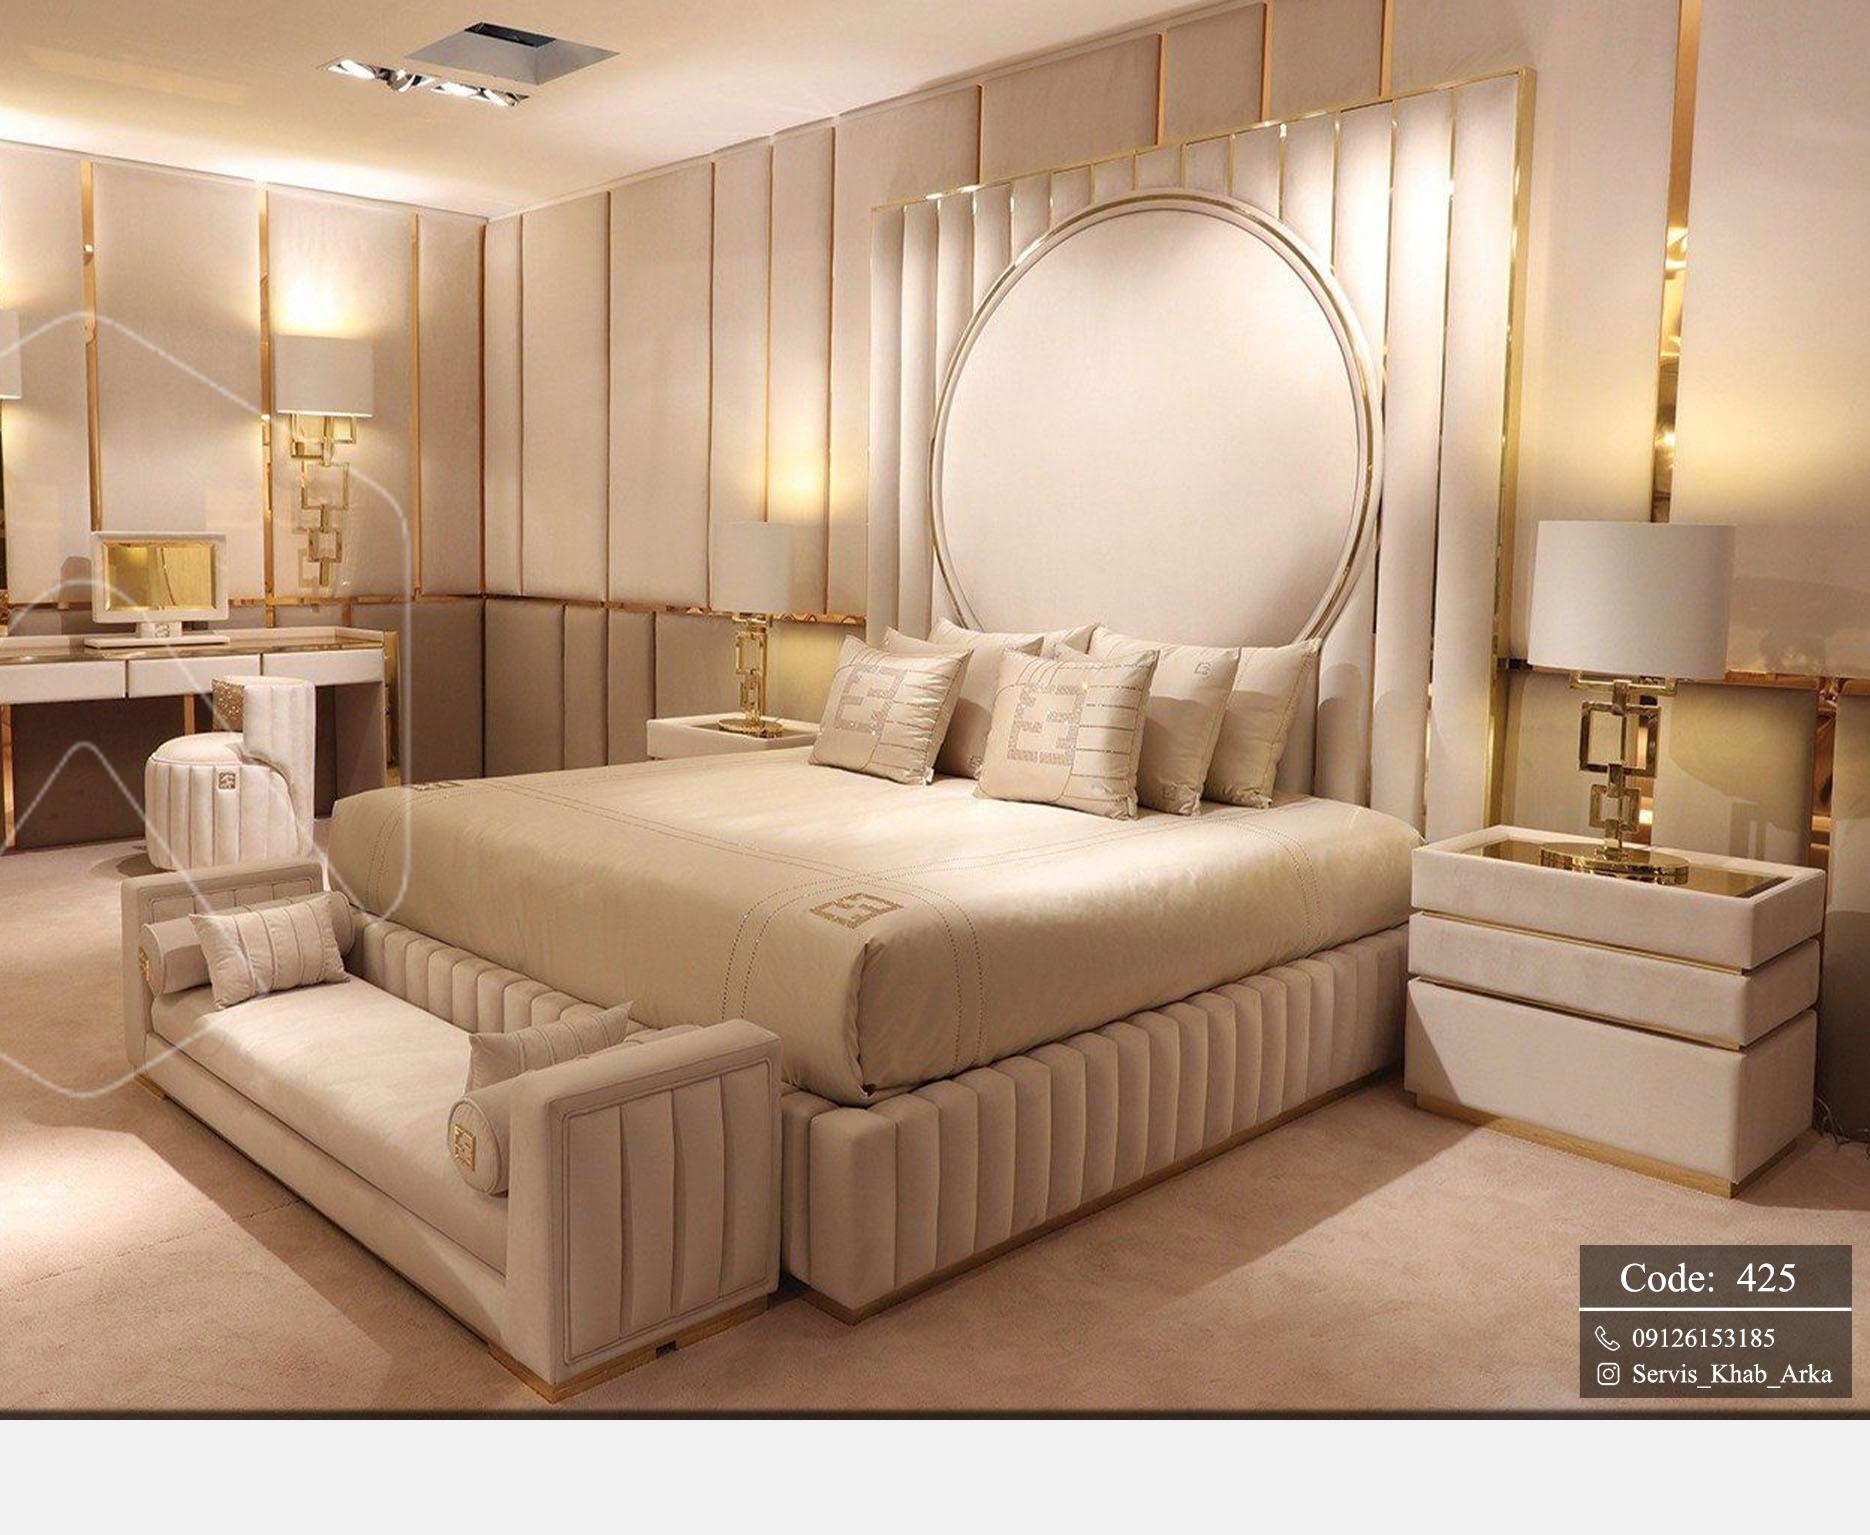 سرویس خواب جدید کد 425